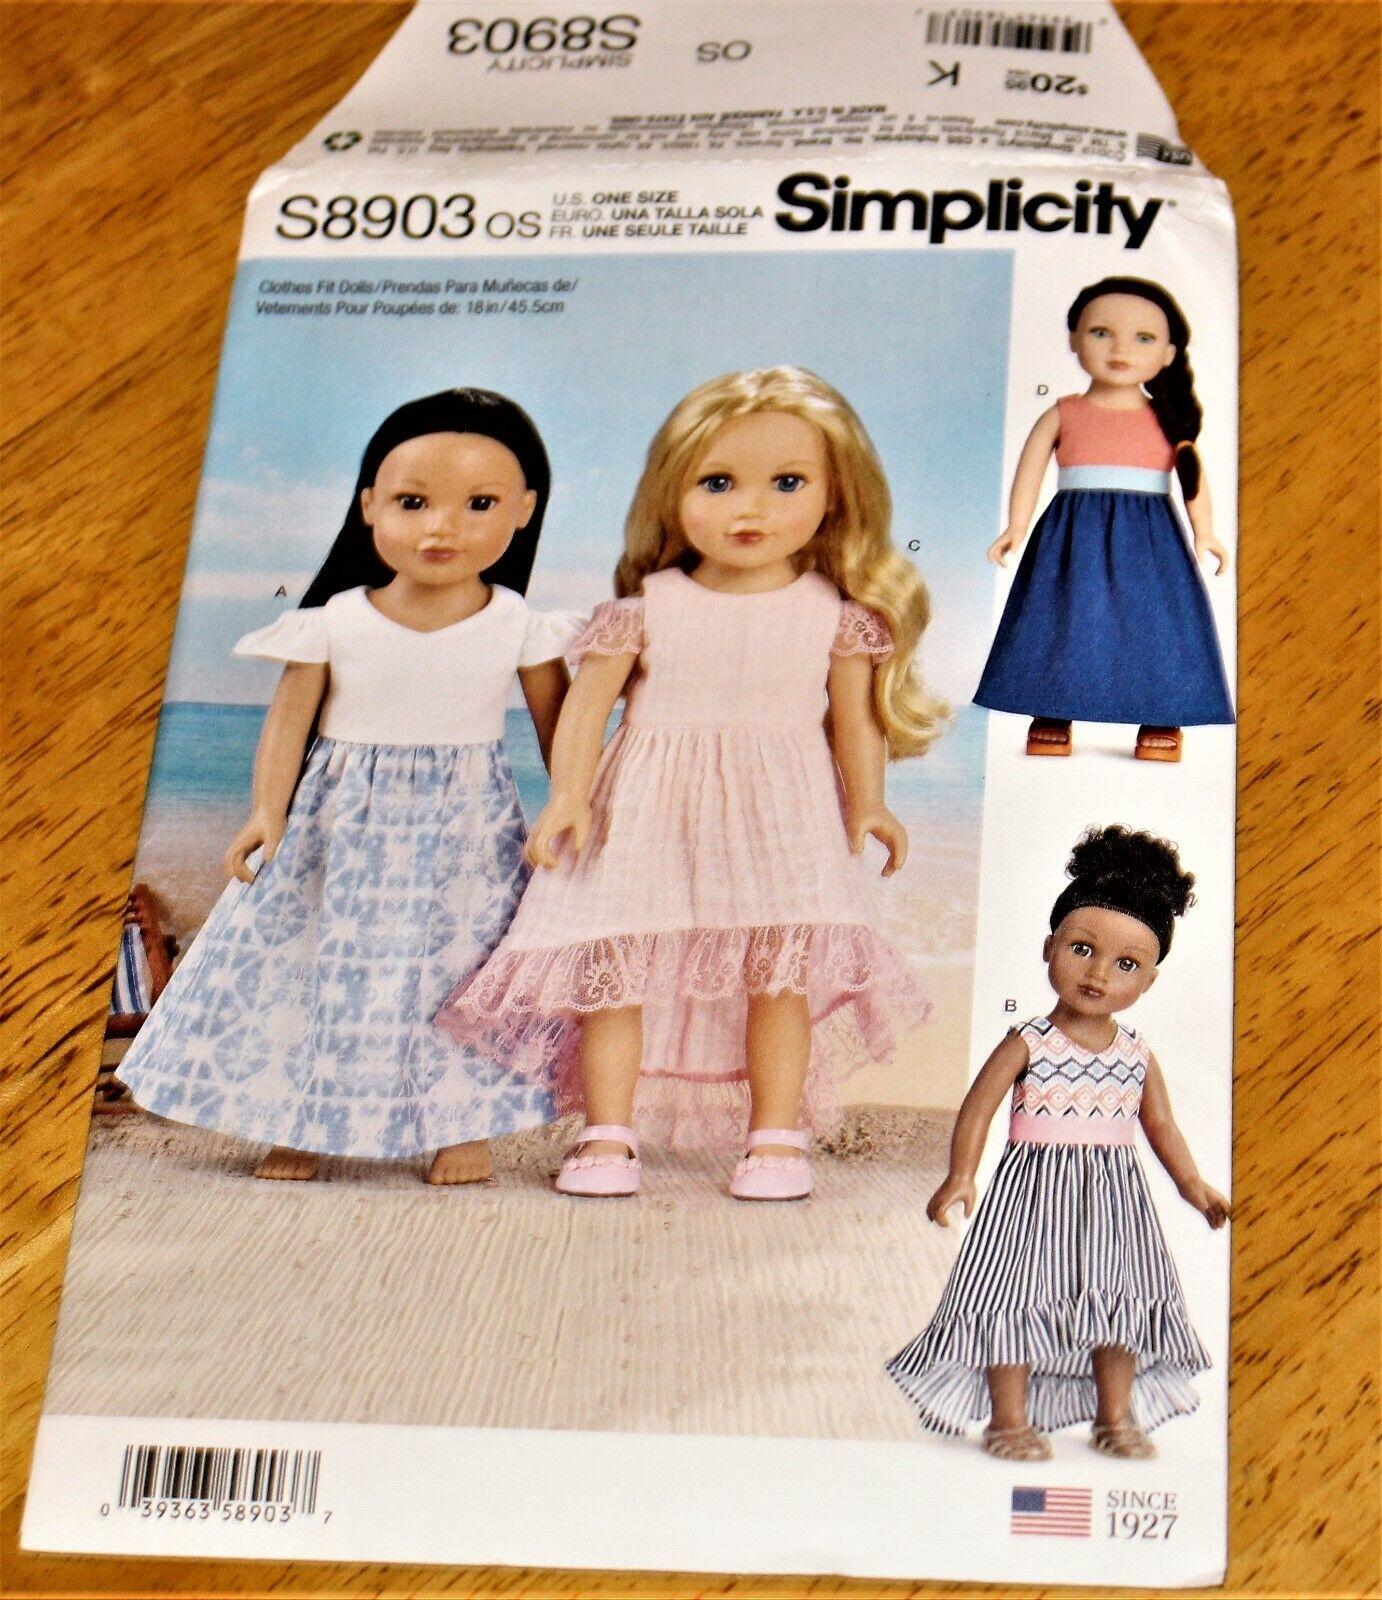 Simplicity Pattern 8903 DRESSES FOR 18 DOLLS - NEW - FOUR DESIGNS - Uncut - $4.49